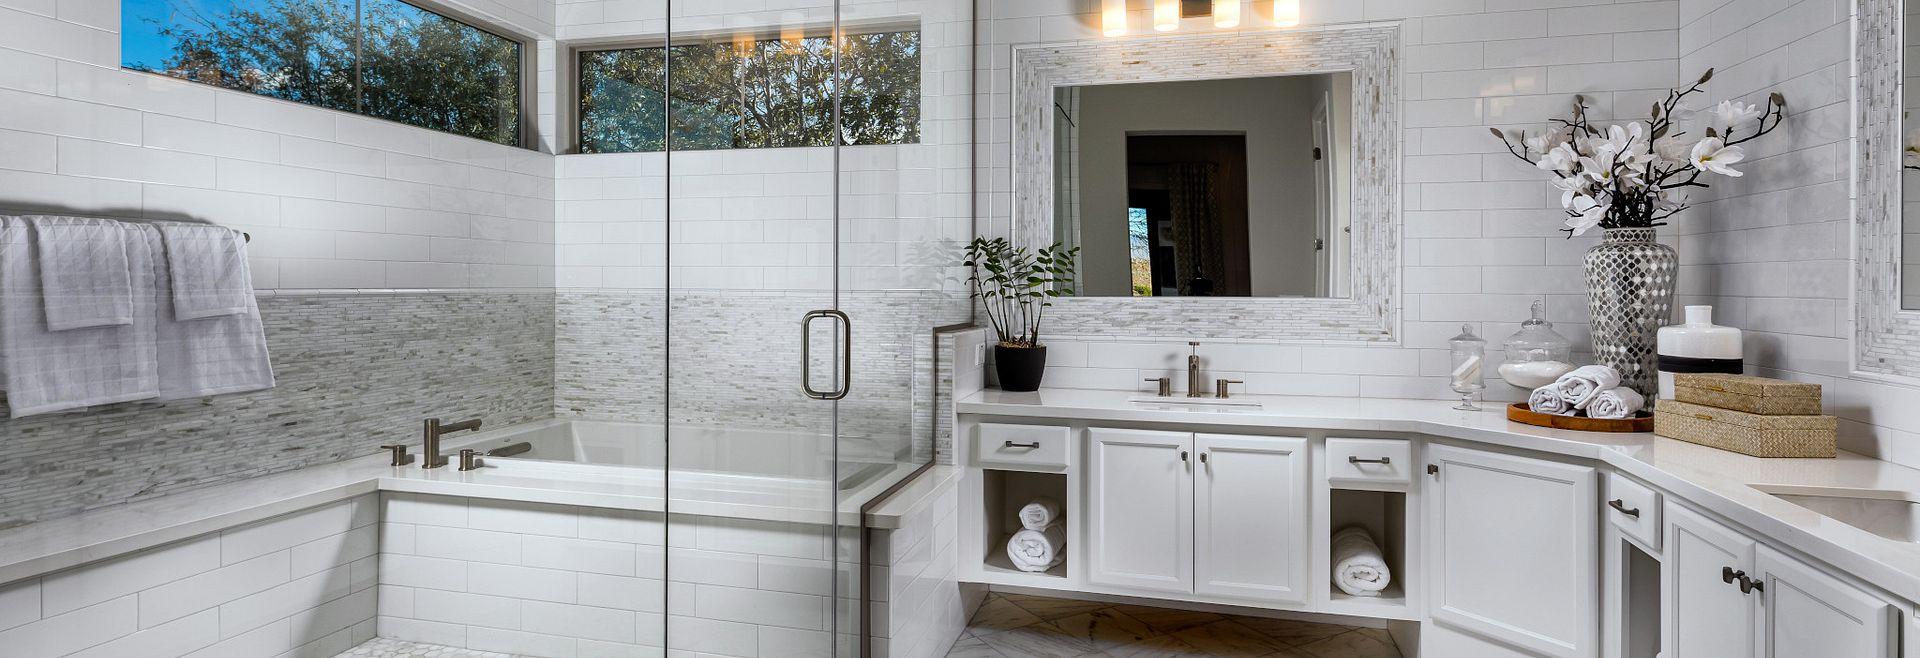 Brasada Model Master Bathroom